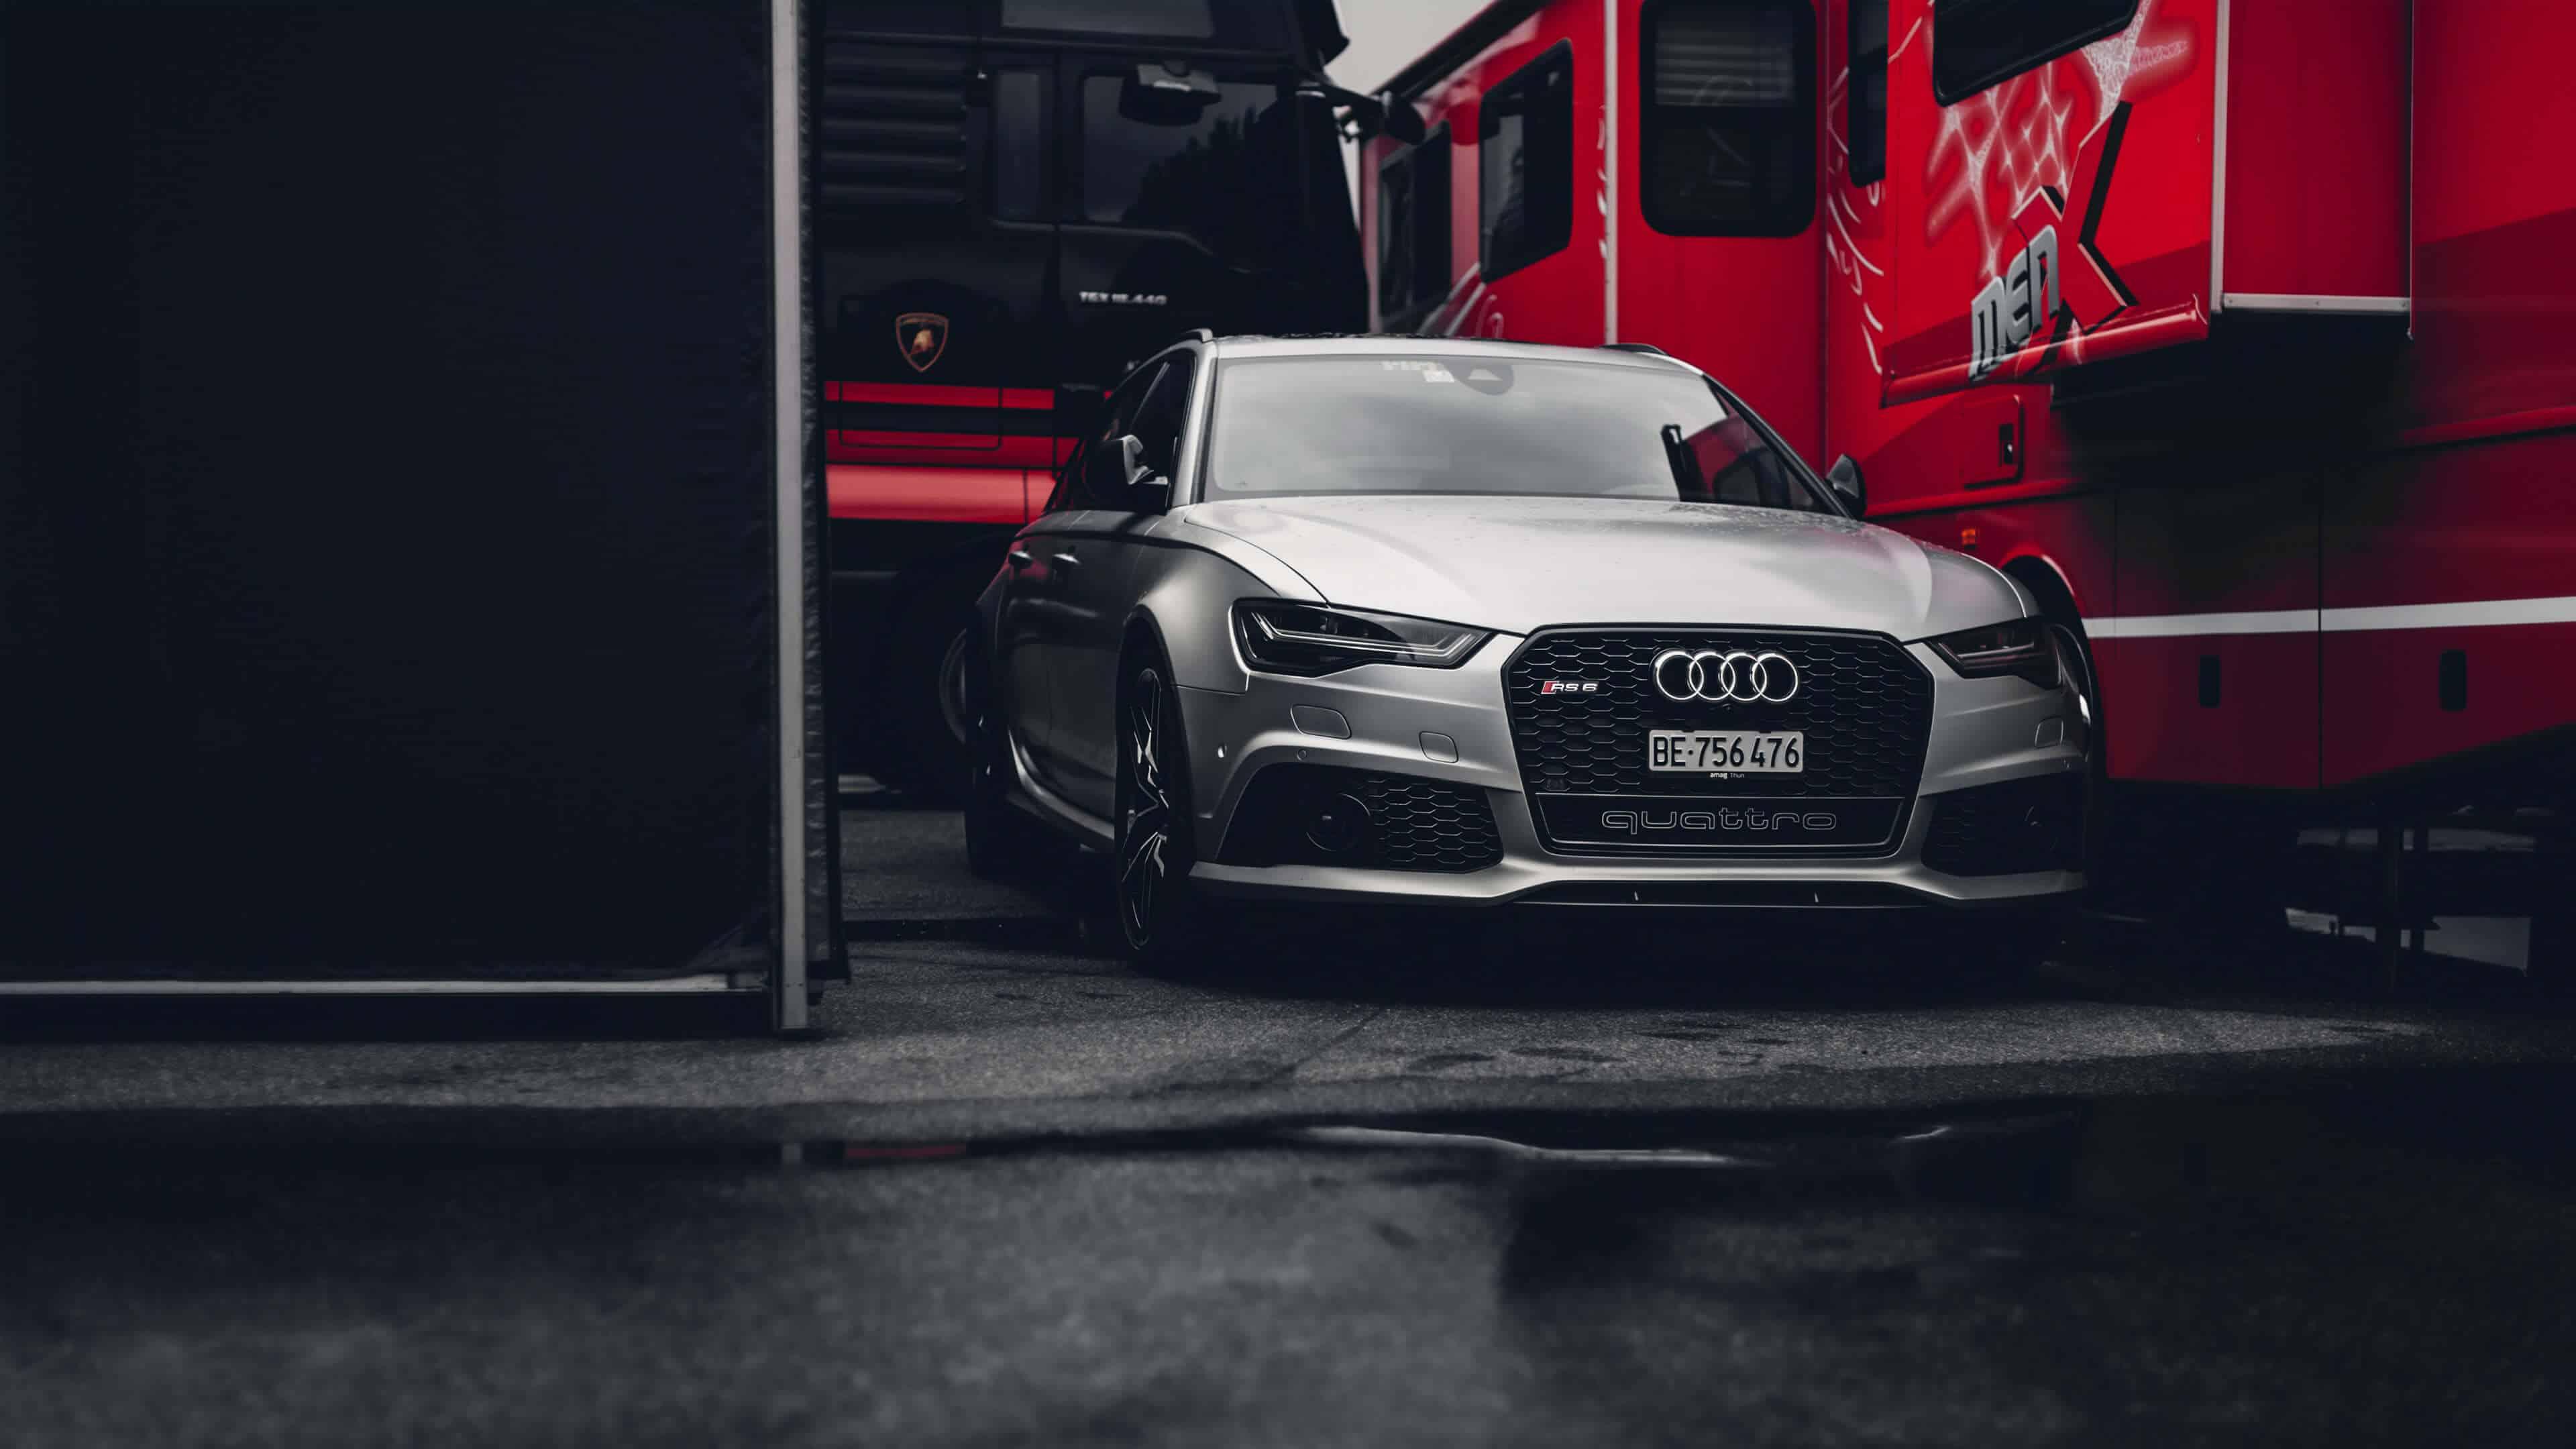 Download Cars Wallpapers For Mobile Audi Rs6 Quattro Uhd 4k Wallpaper Pixelz